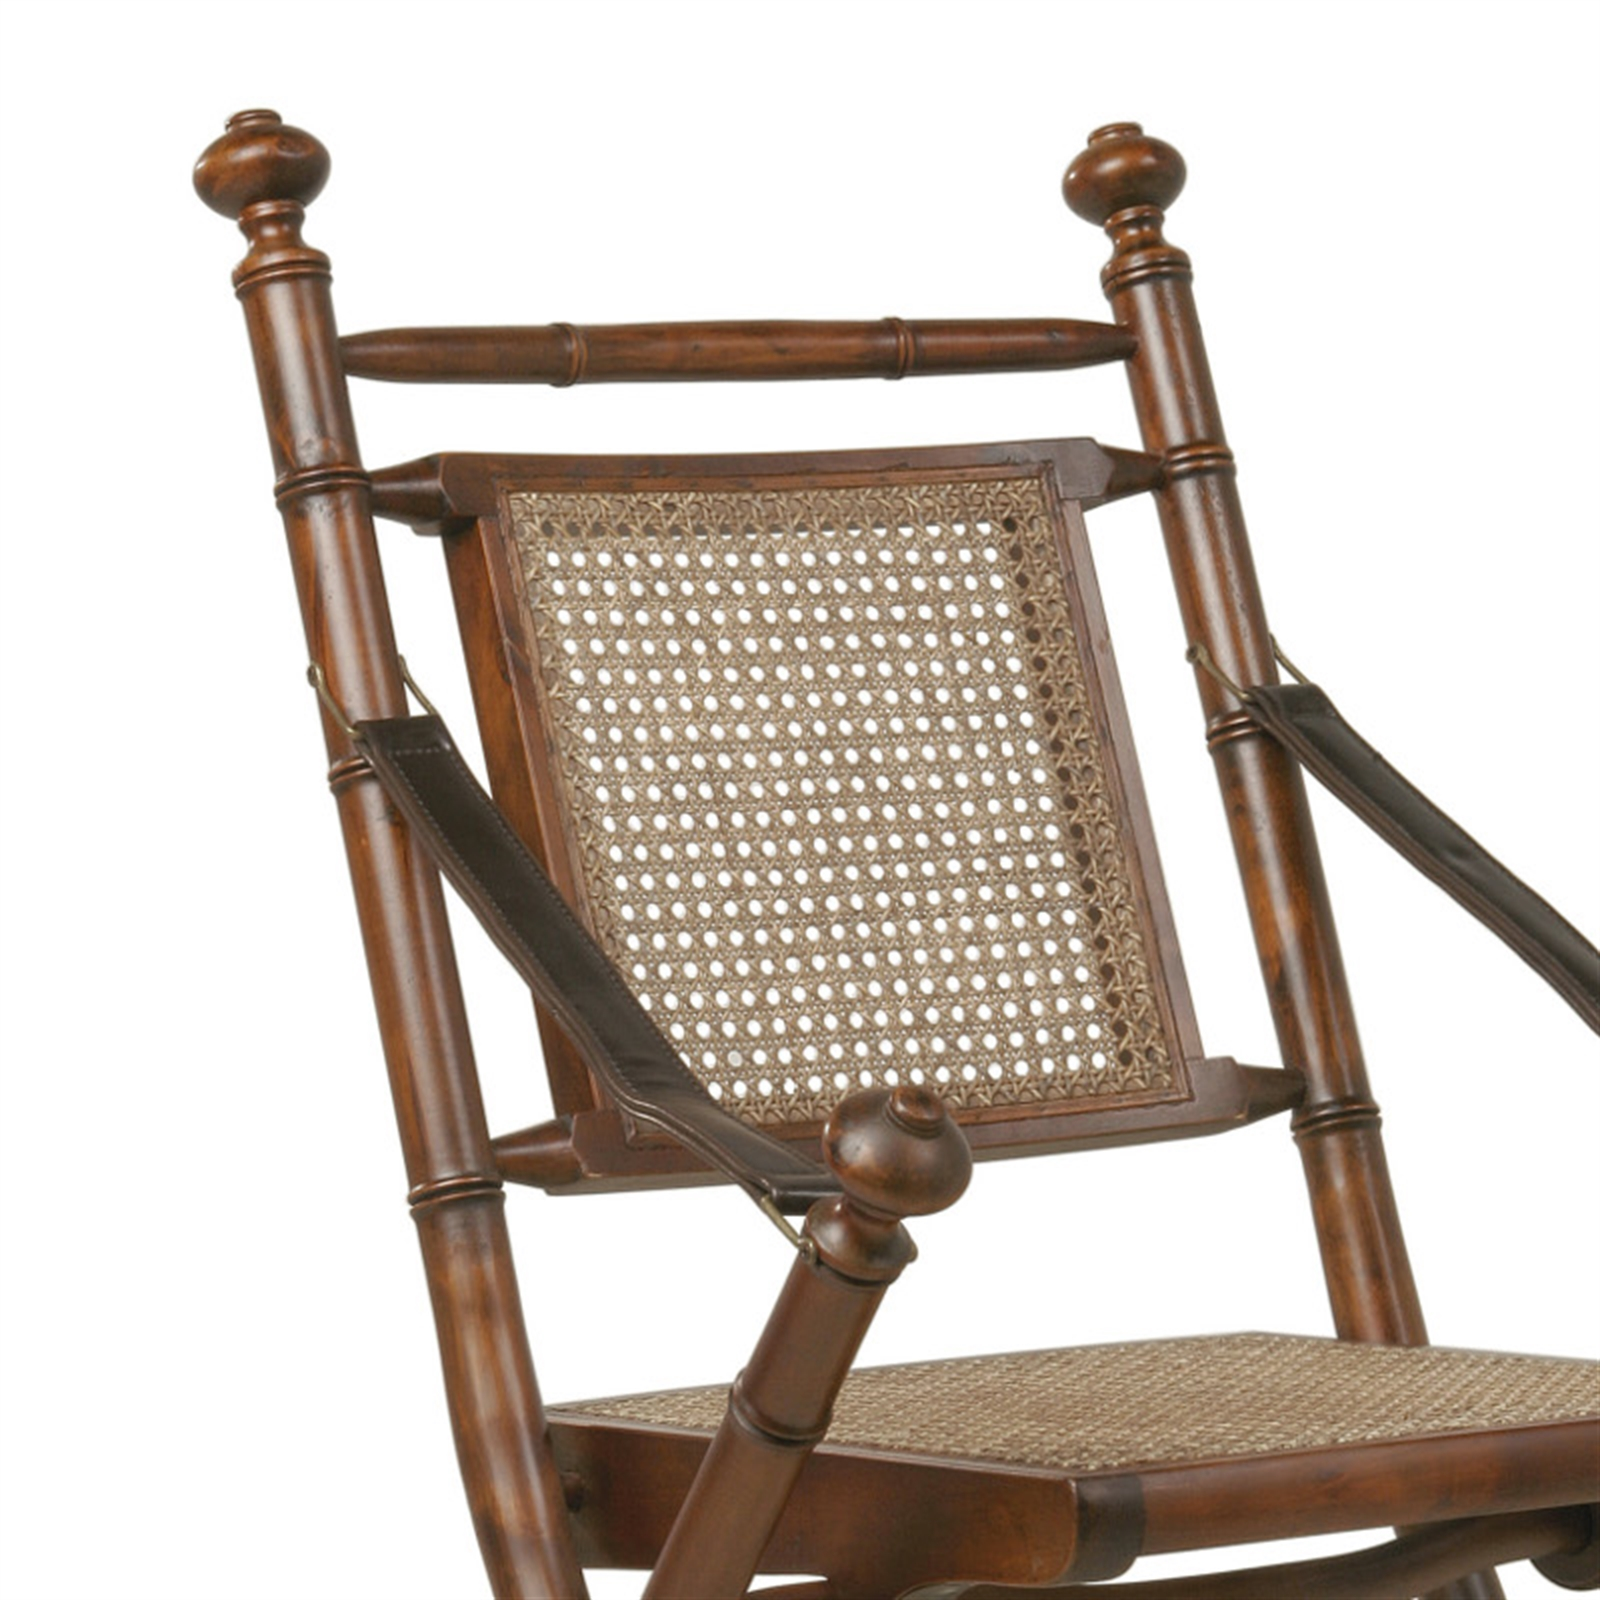 design holz klappstuhl colonial schreibtischstuhl rattan dunkelbraun ebay. Black Bedroom Furniture Sets. Home Design Ideas